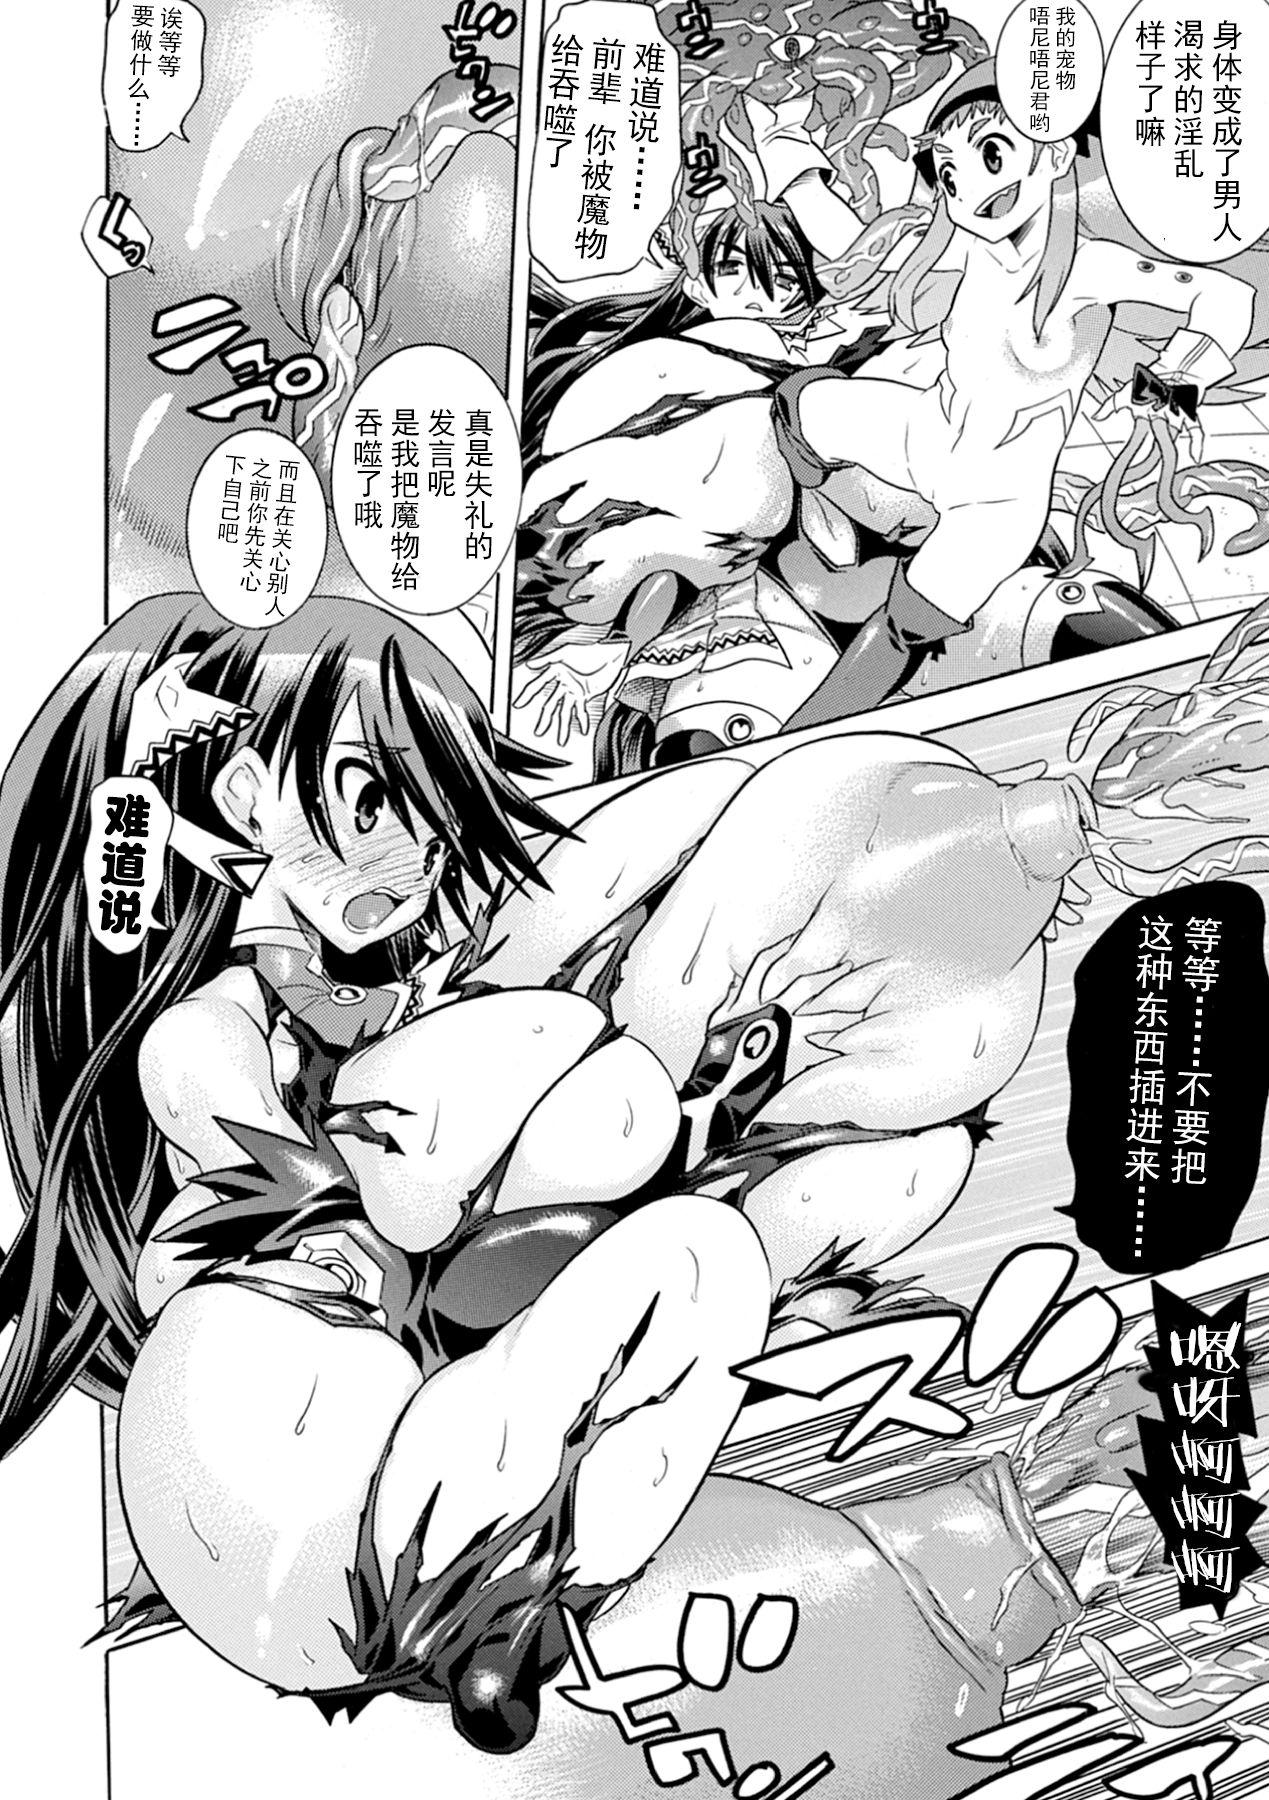 Jintai Kaizou Anthology Comics Vol. 1 32